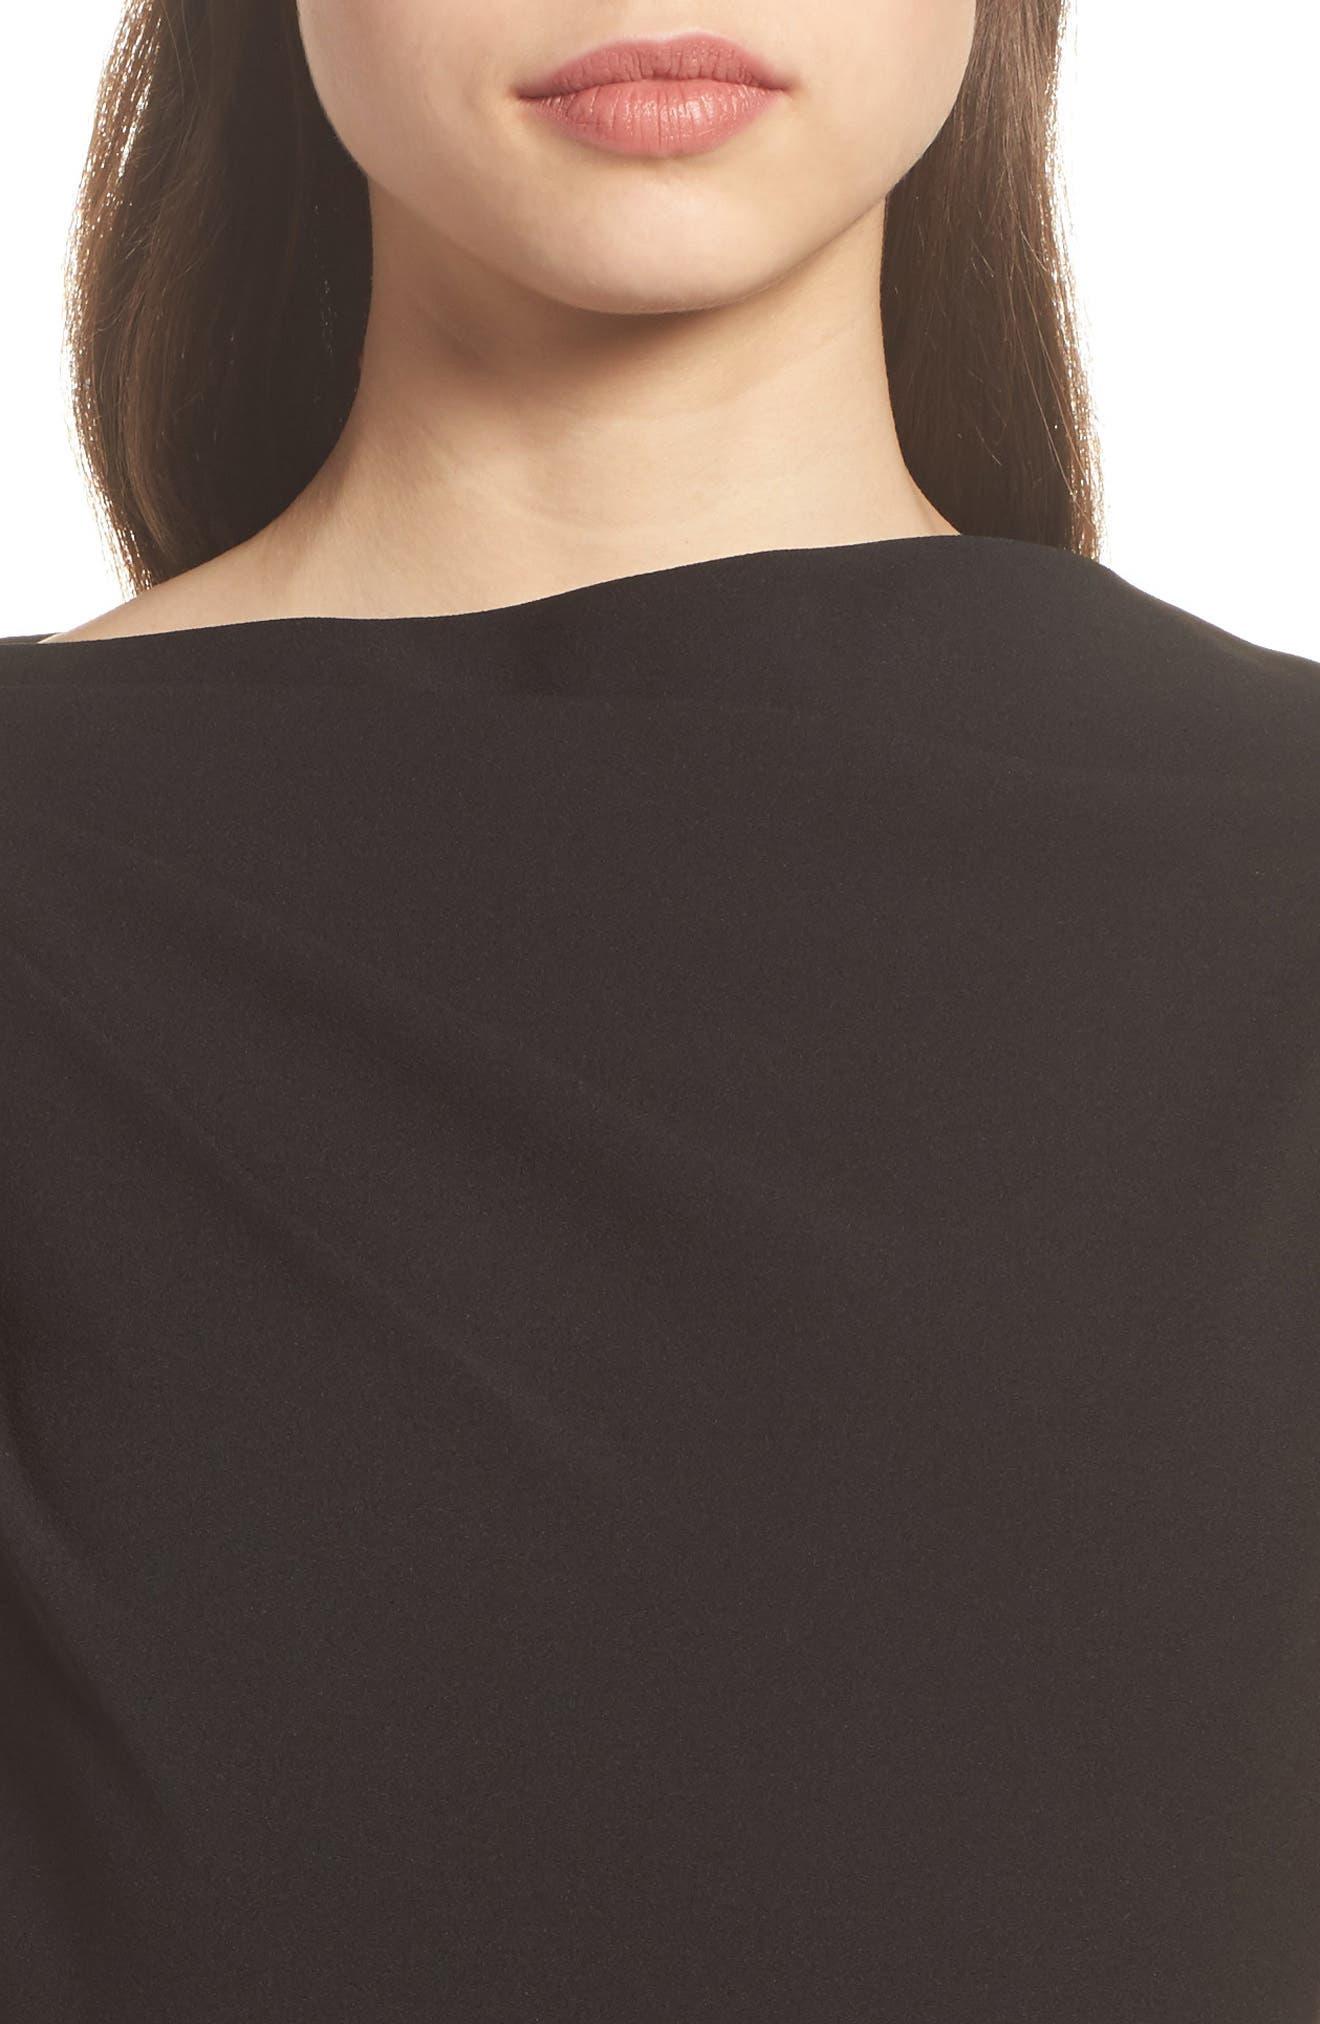 High Neck Sheath Dress,                             Alternate thumbnail 4, color,                             Black